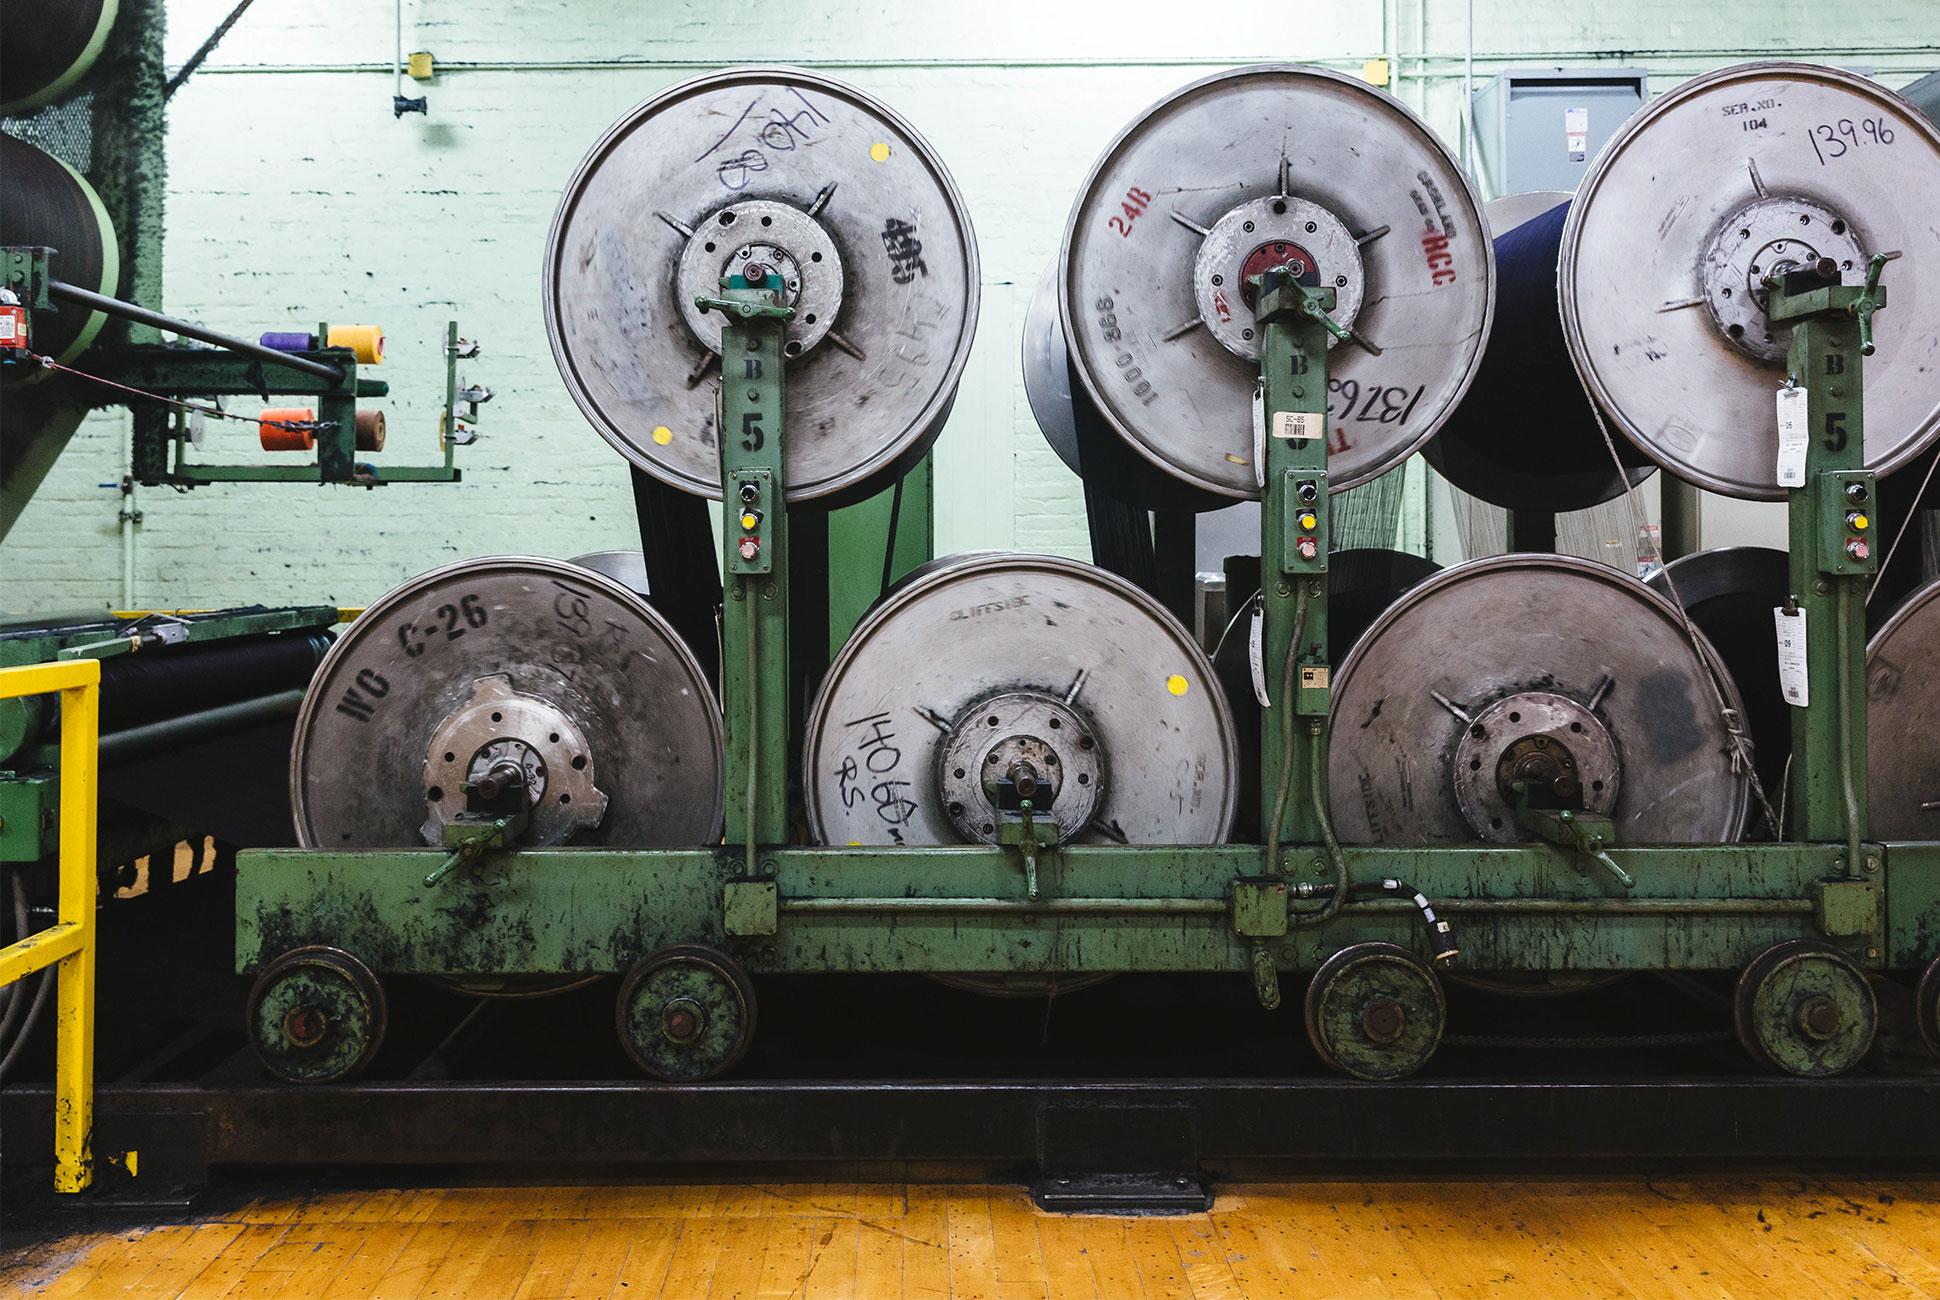 cone-mills-gear-patrol-cp-2018-09.jpg